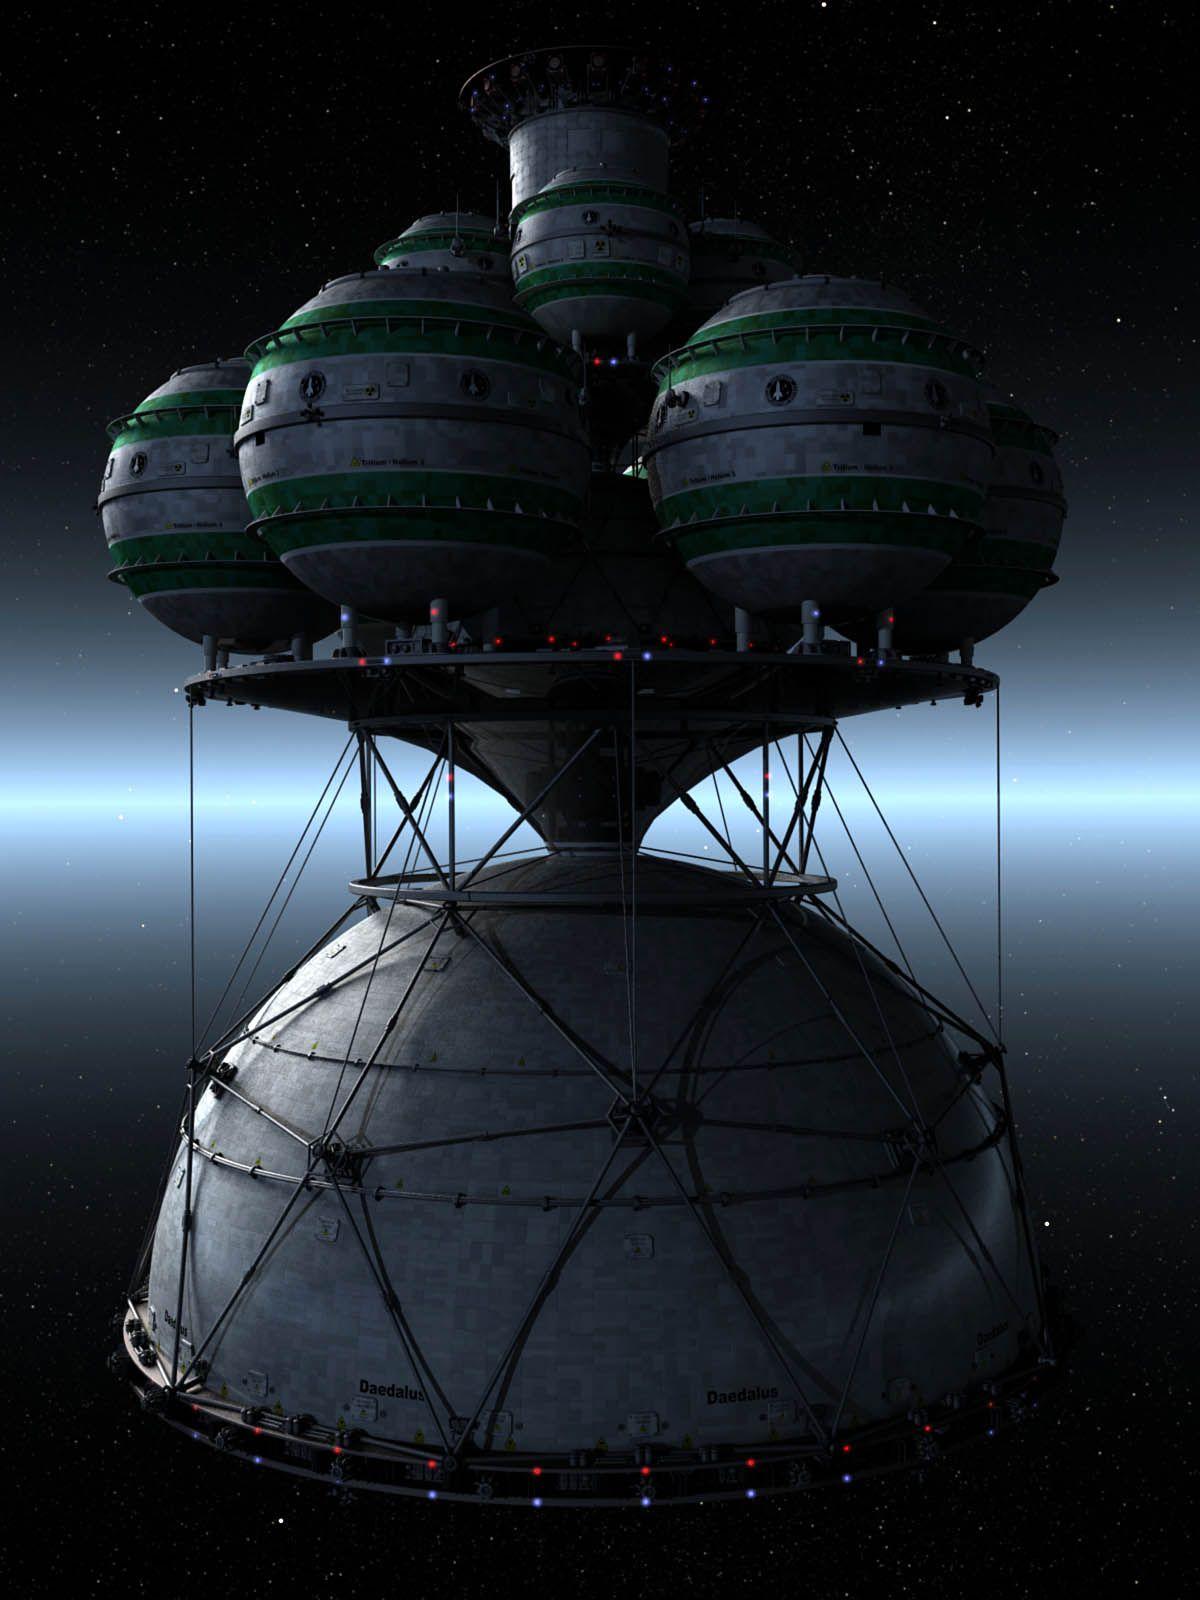 Daedalus Realistic Spacecraft Pinterest Spaceship